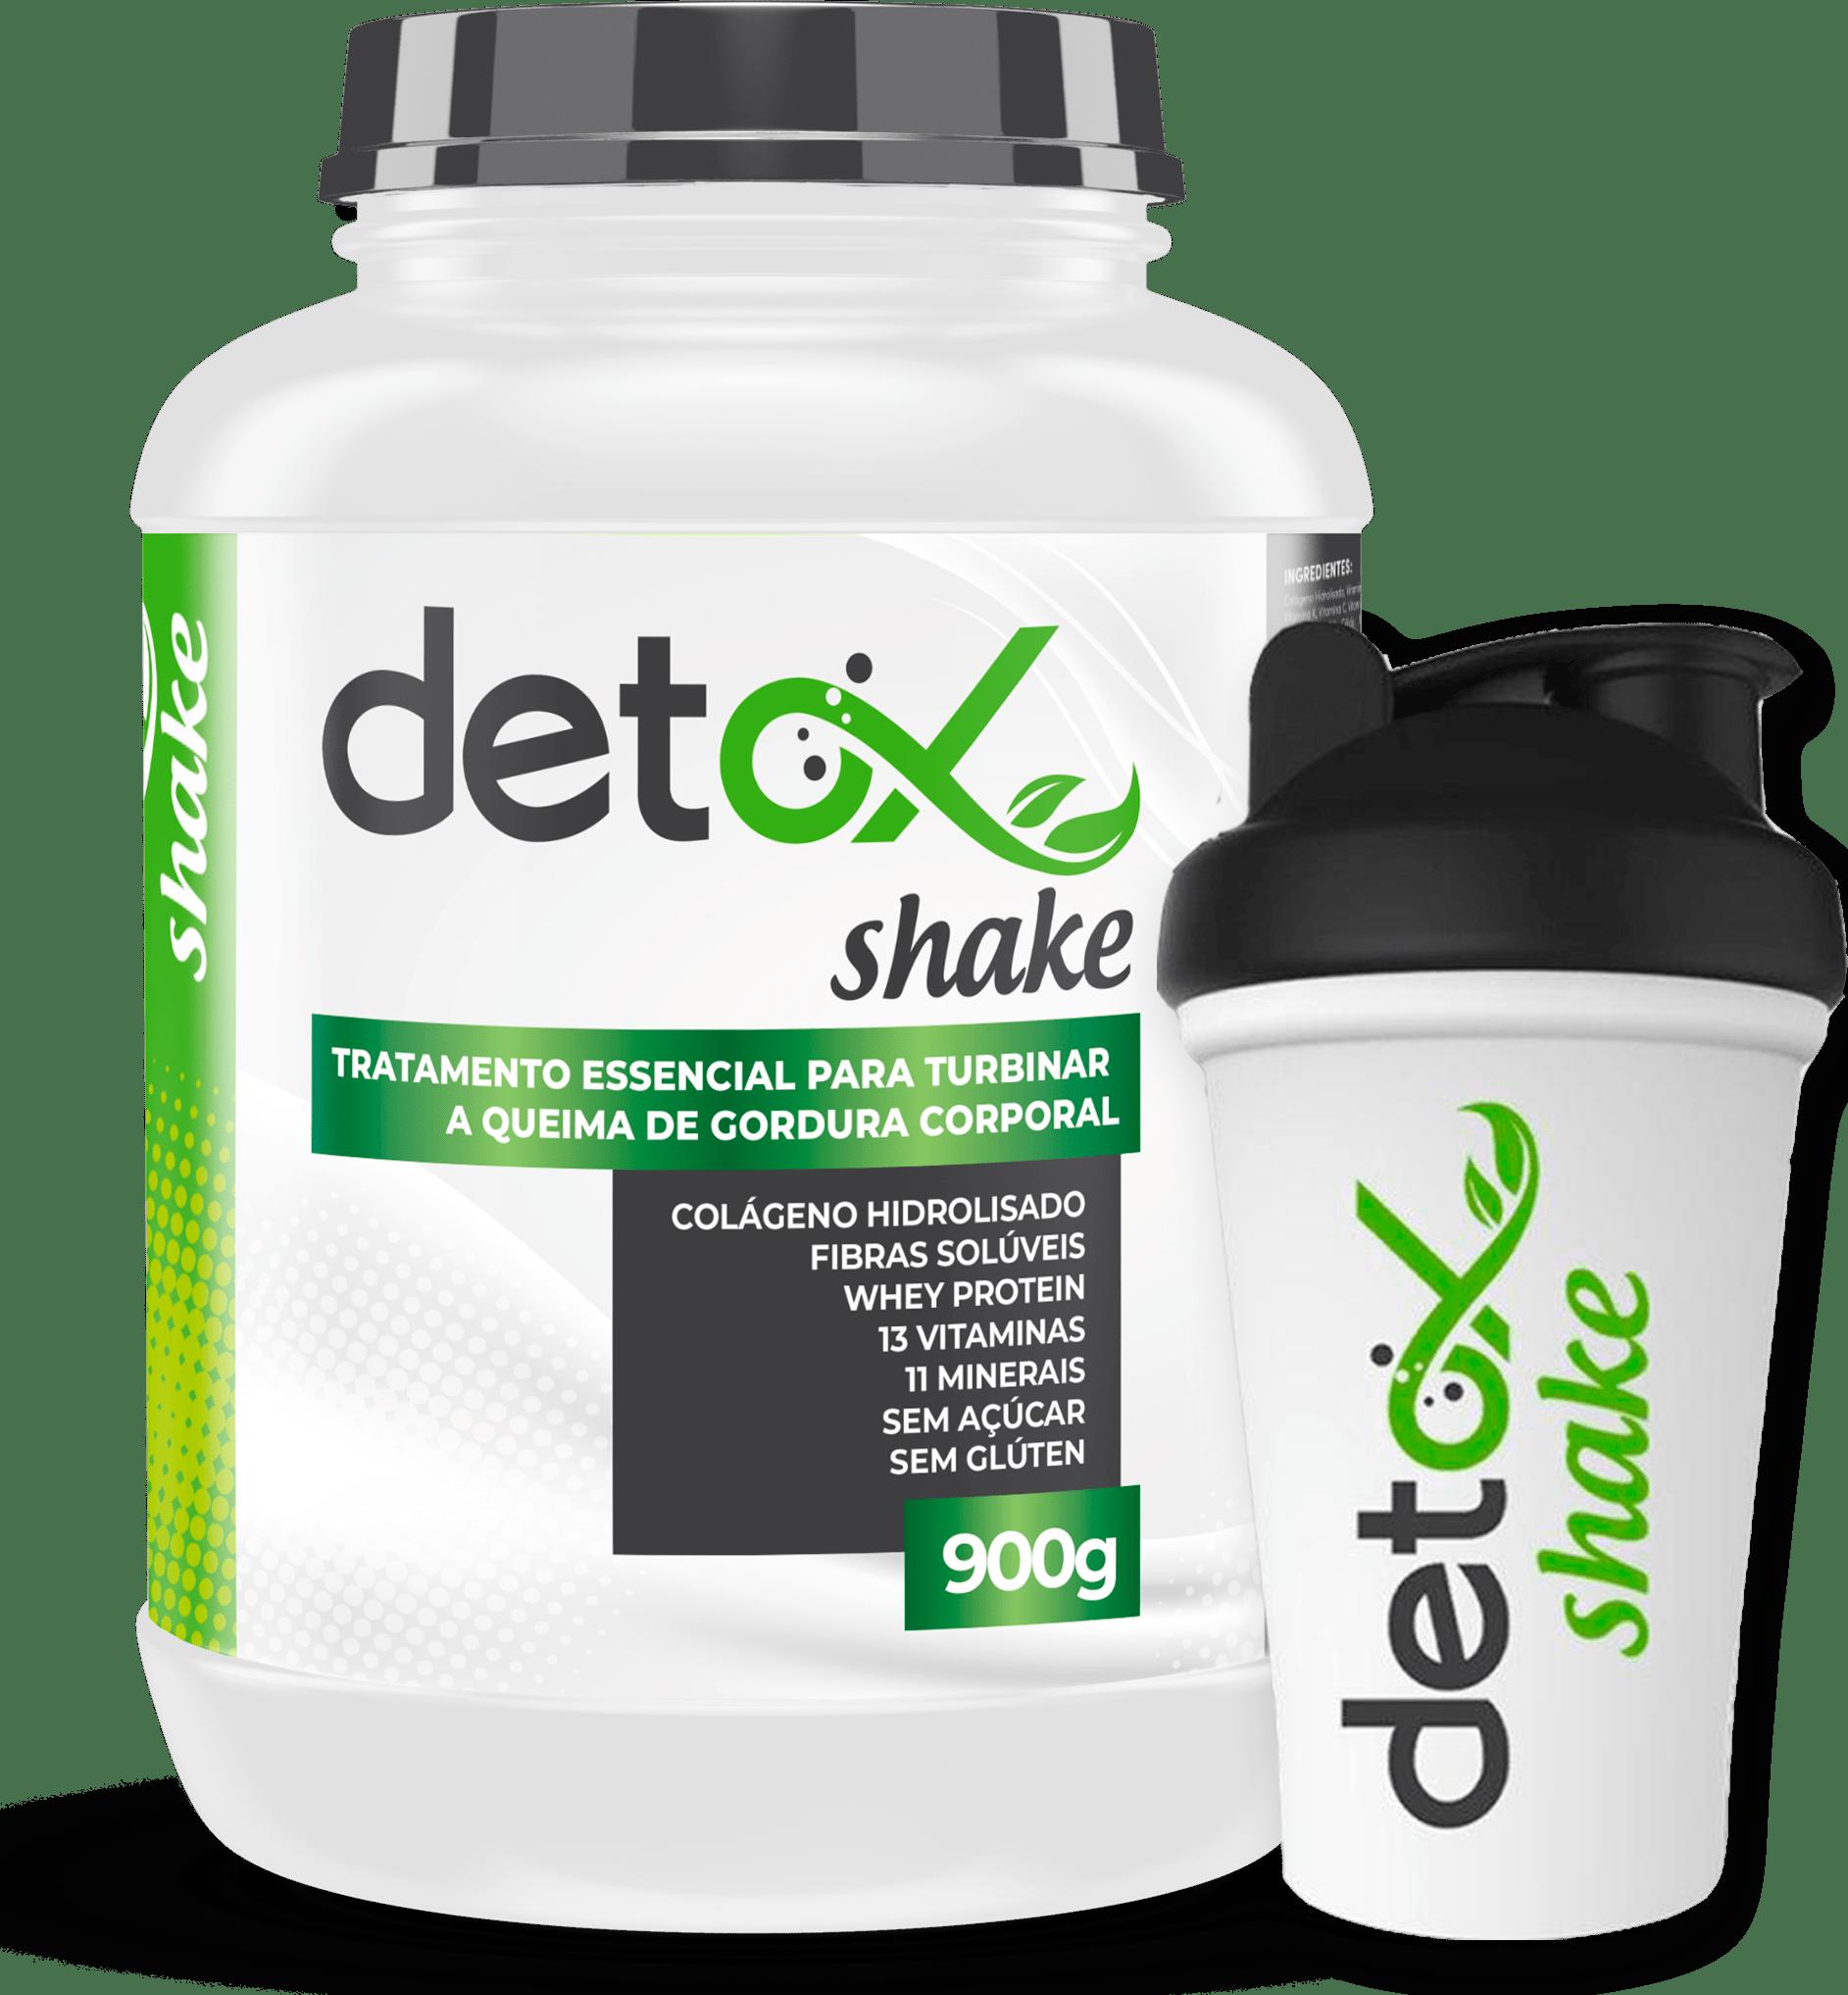 detox shake comprar